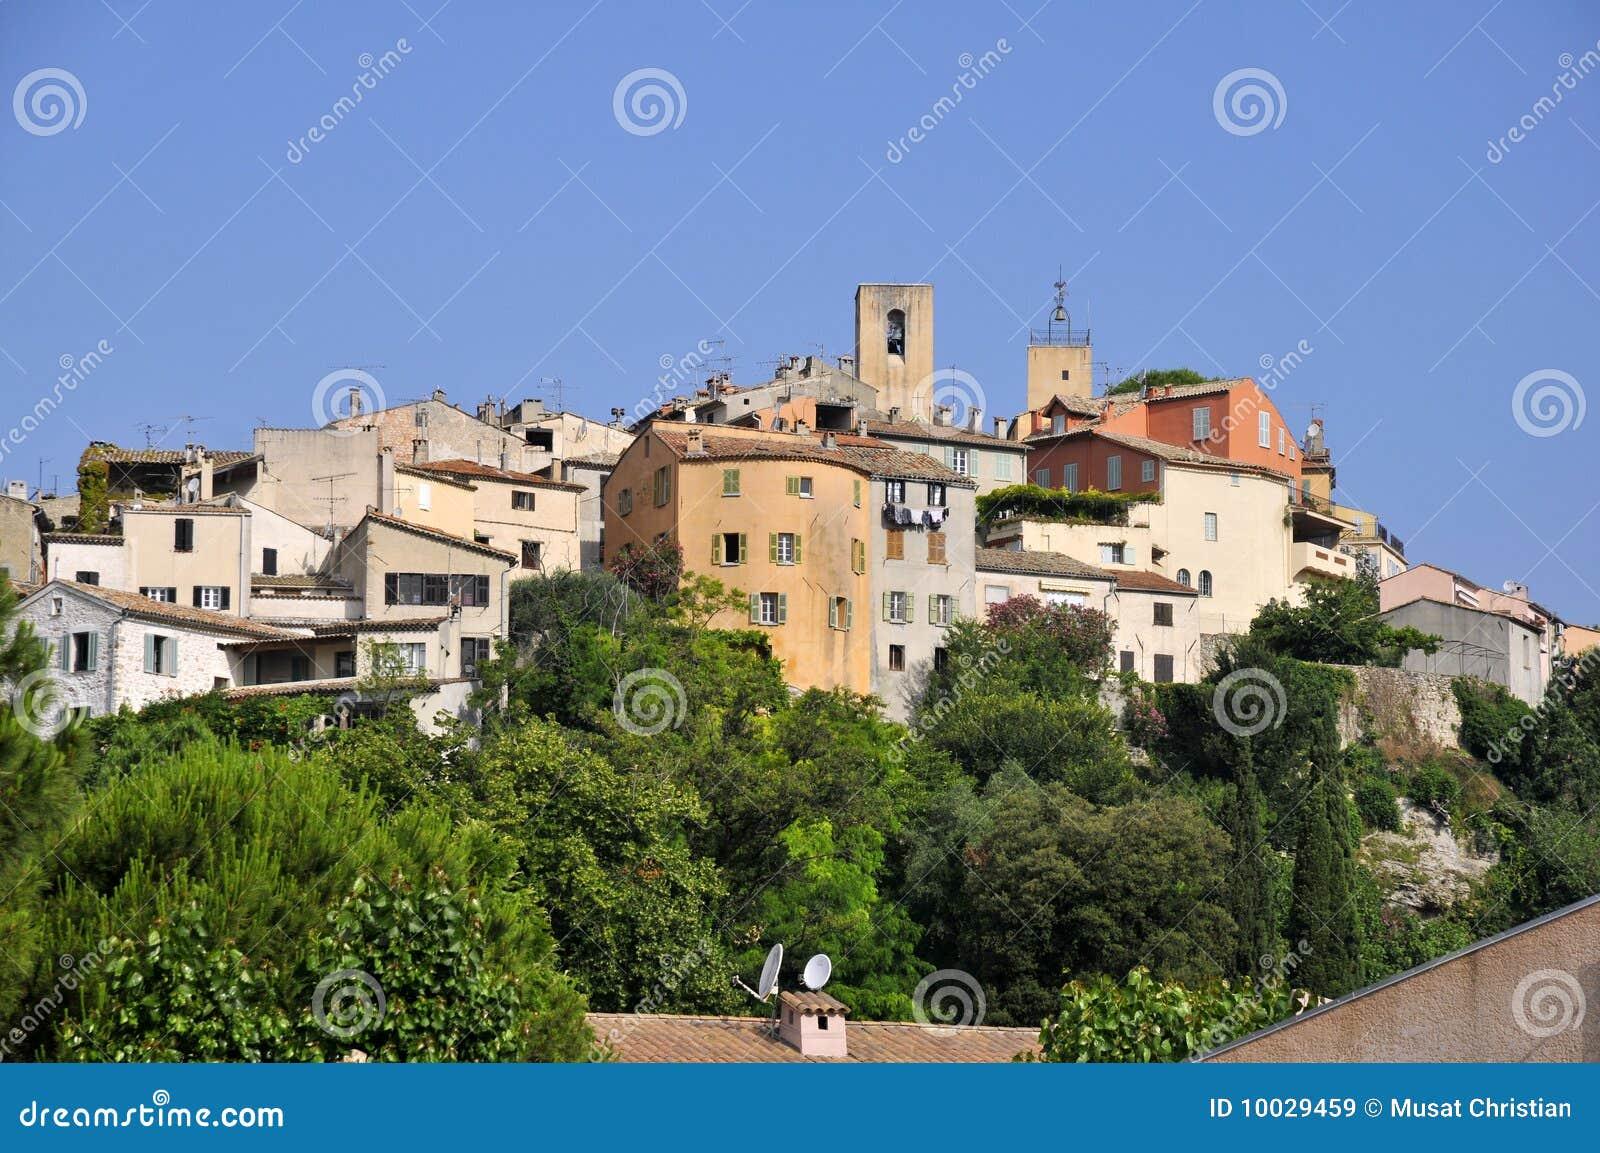 Biot France  city pictures gallery : village biot france 10029459